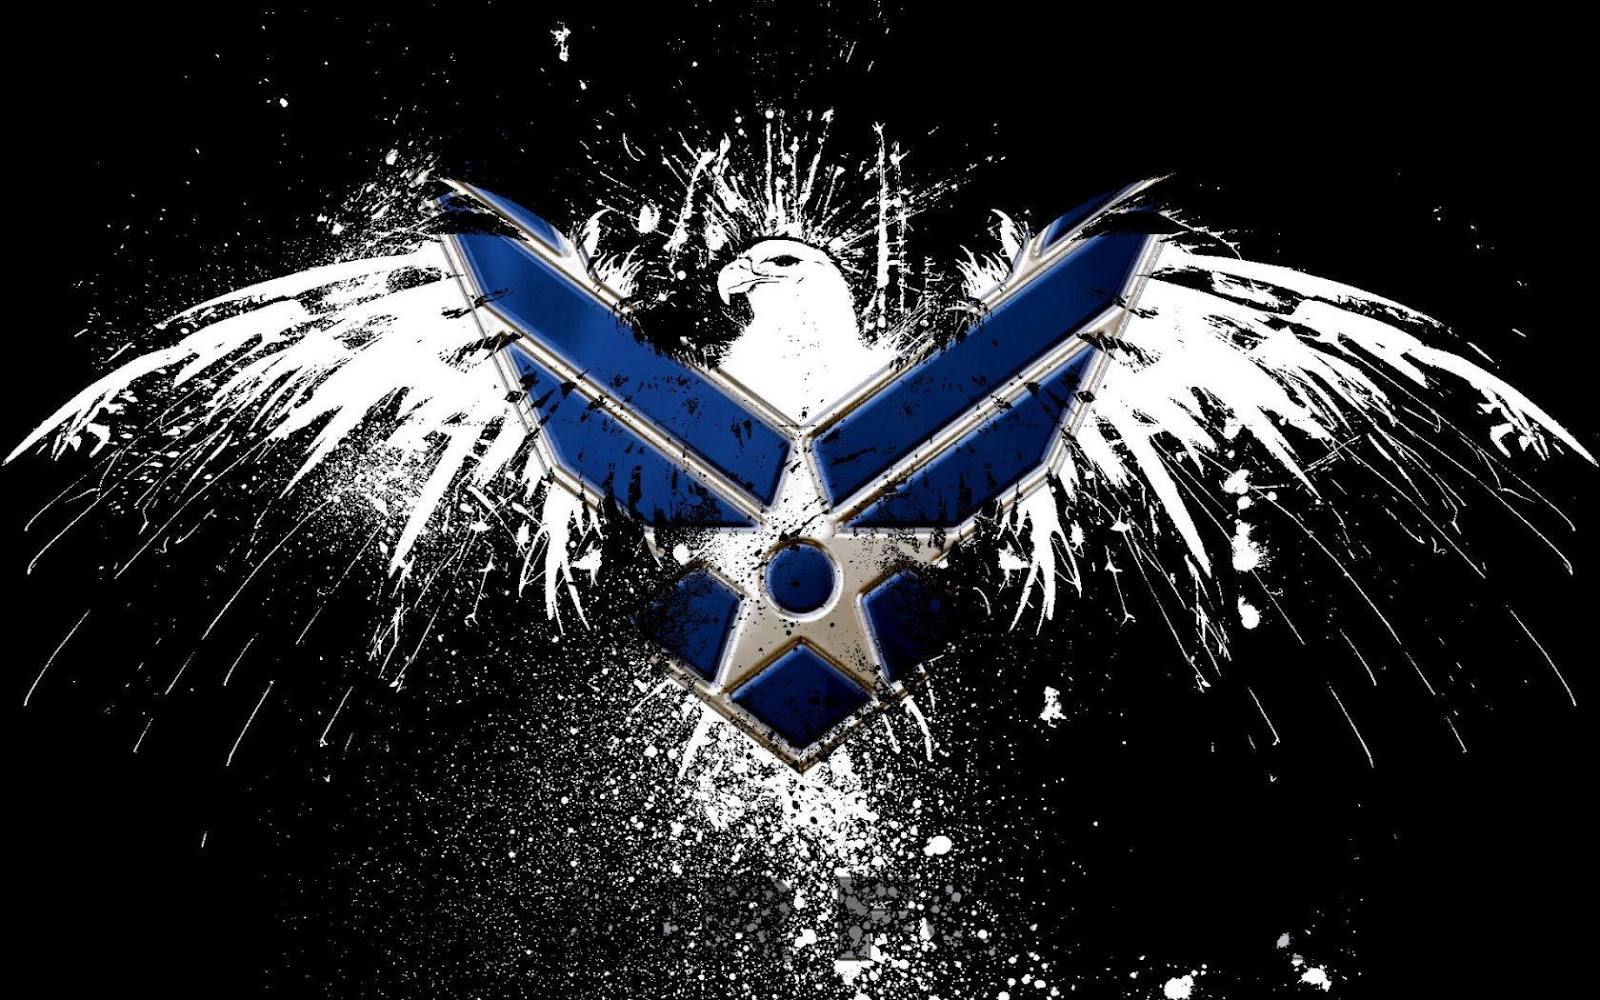 Air Force Logo HD Wallpaper Slwallpapers 1600x1000